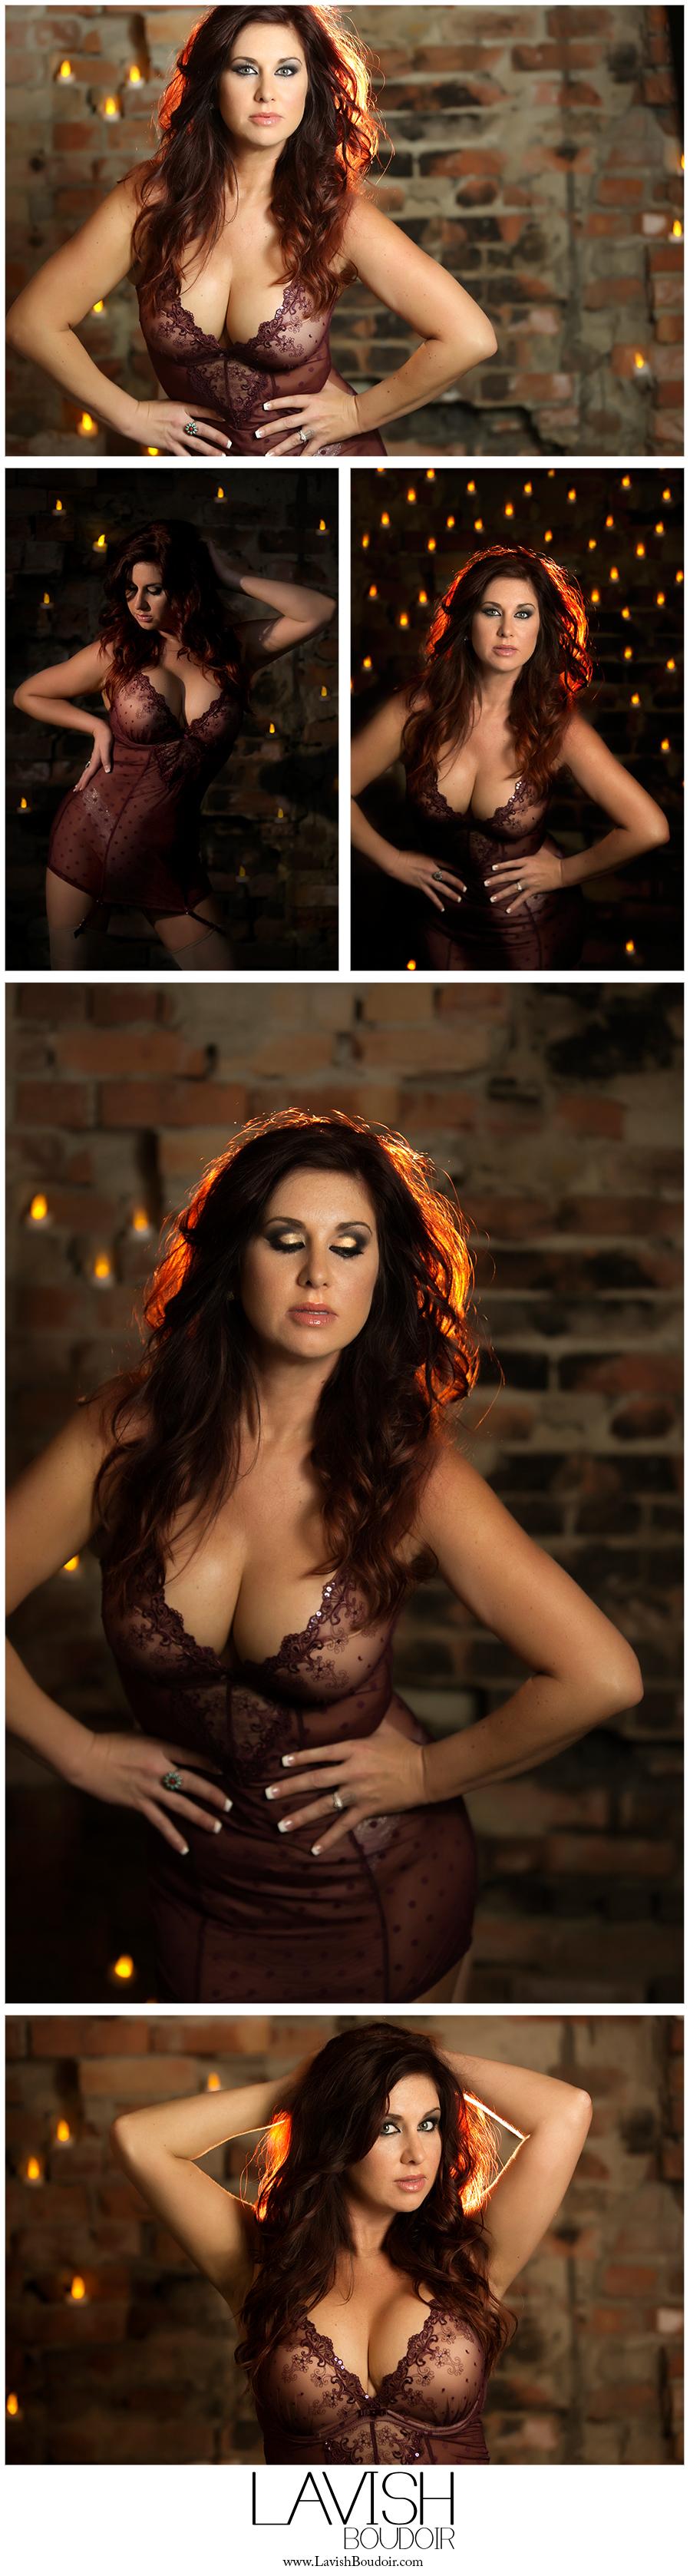 JM-Blog-Collage-candles-Lavish-Boudoir.jpg